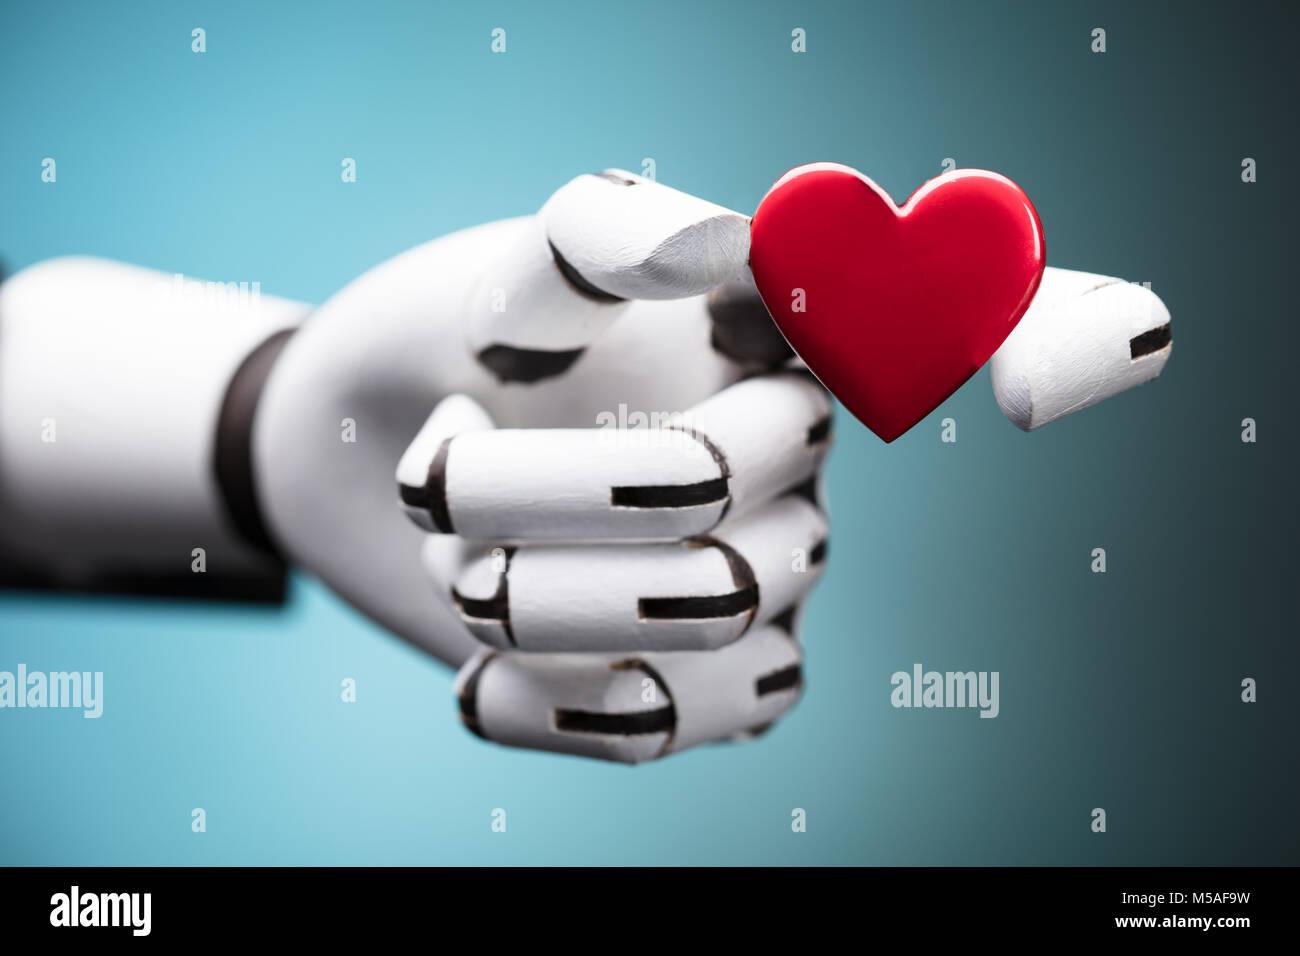 Artificial Heart Stock Photos & Artificial Heart Stock Images - Alamy